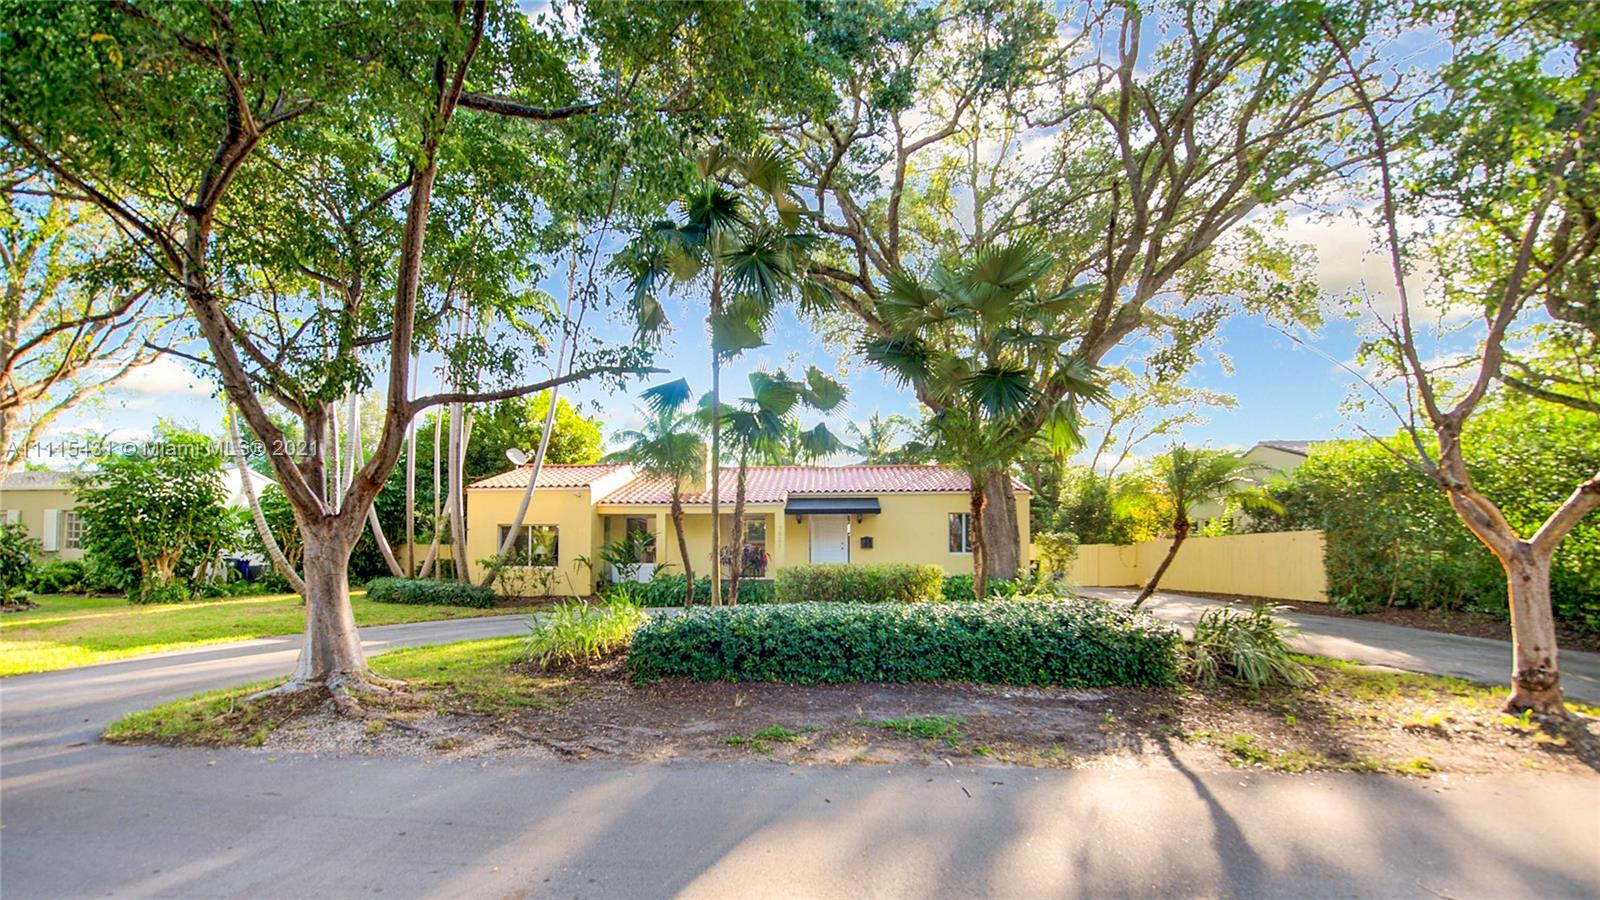 Single Family Home,For Sale,7531 SW 52 Ct, Miami, Florida 33143,Brickell,realty,broker,condos near me